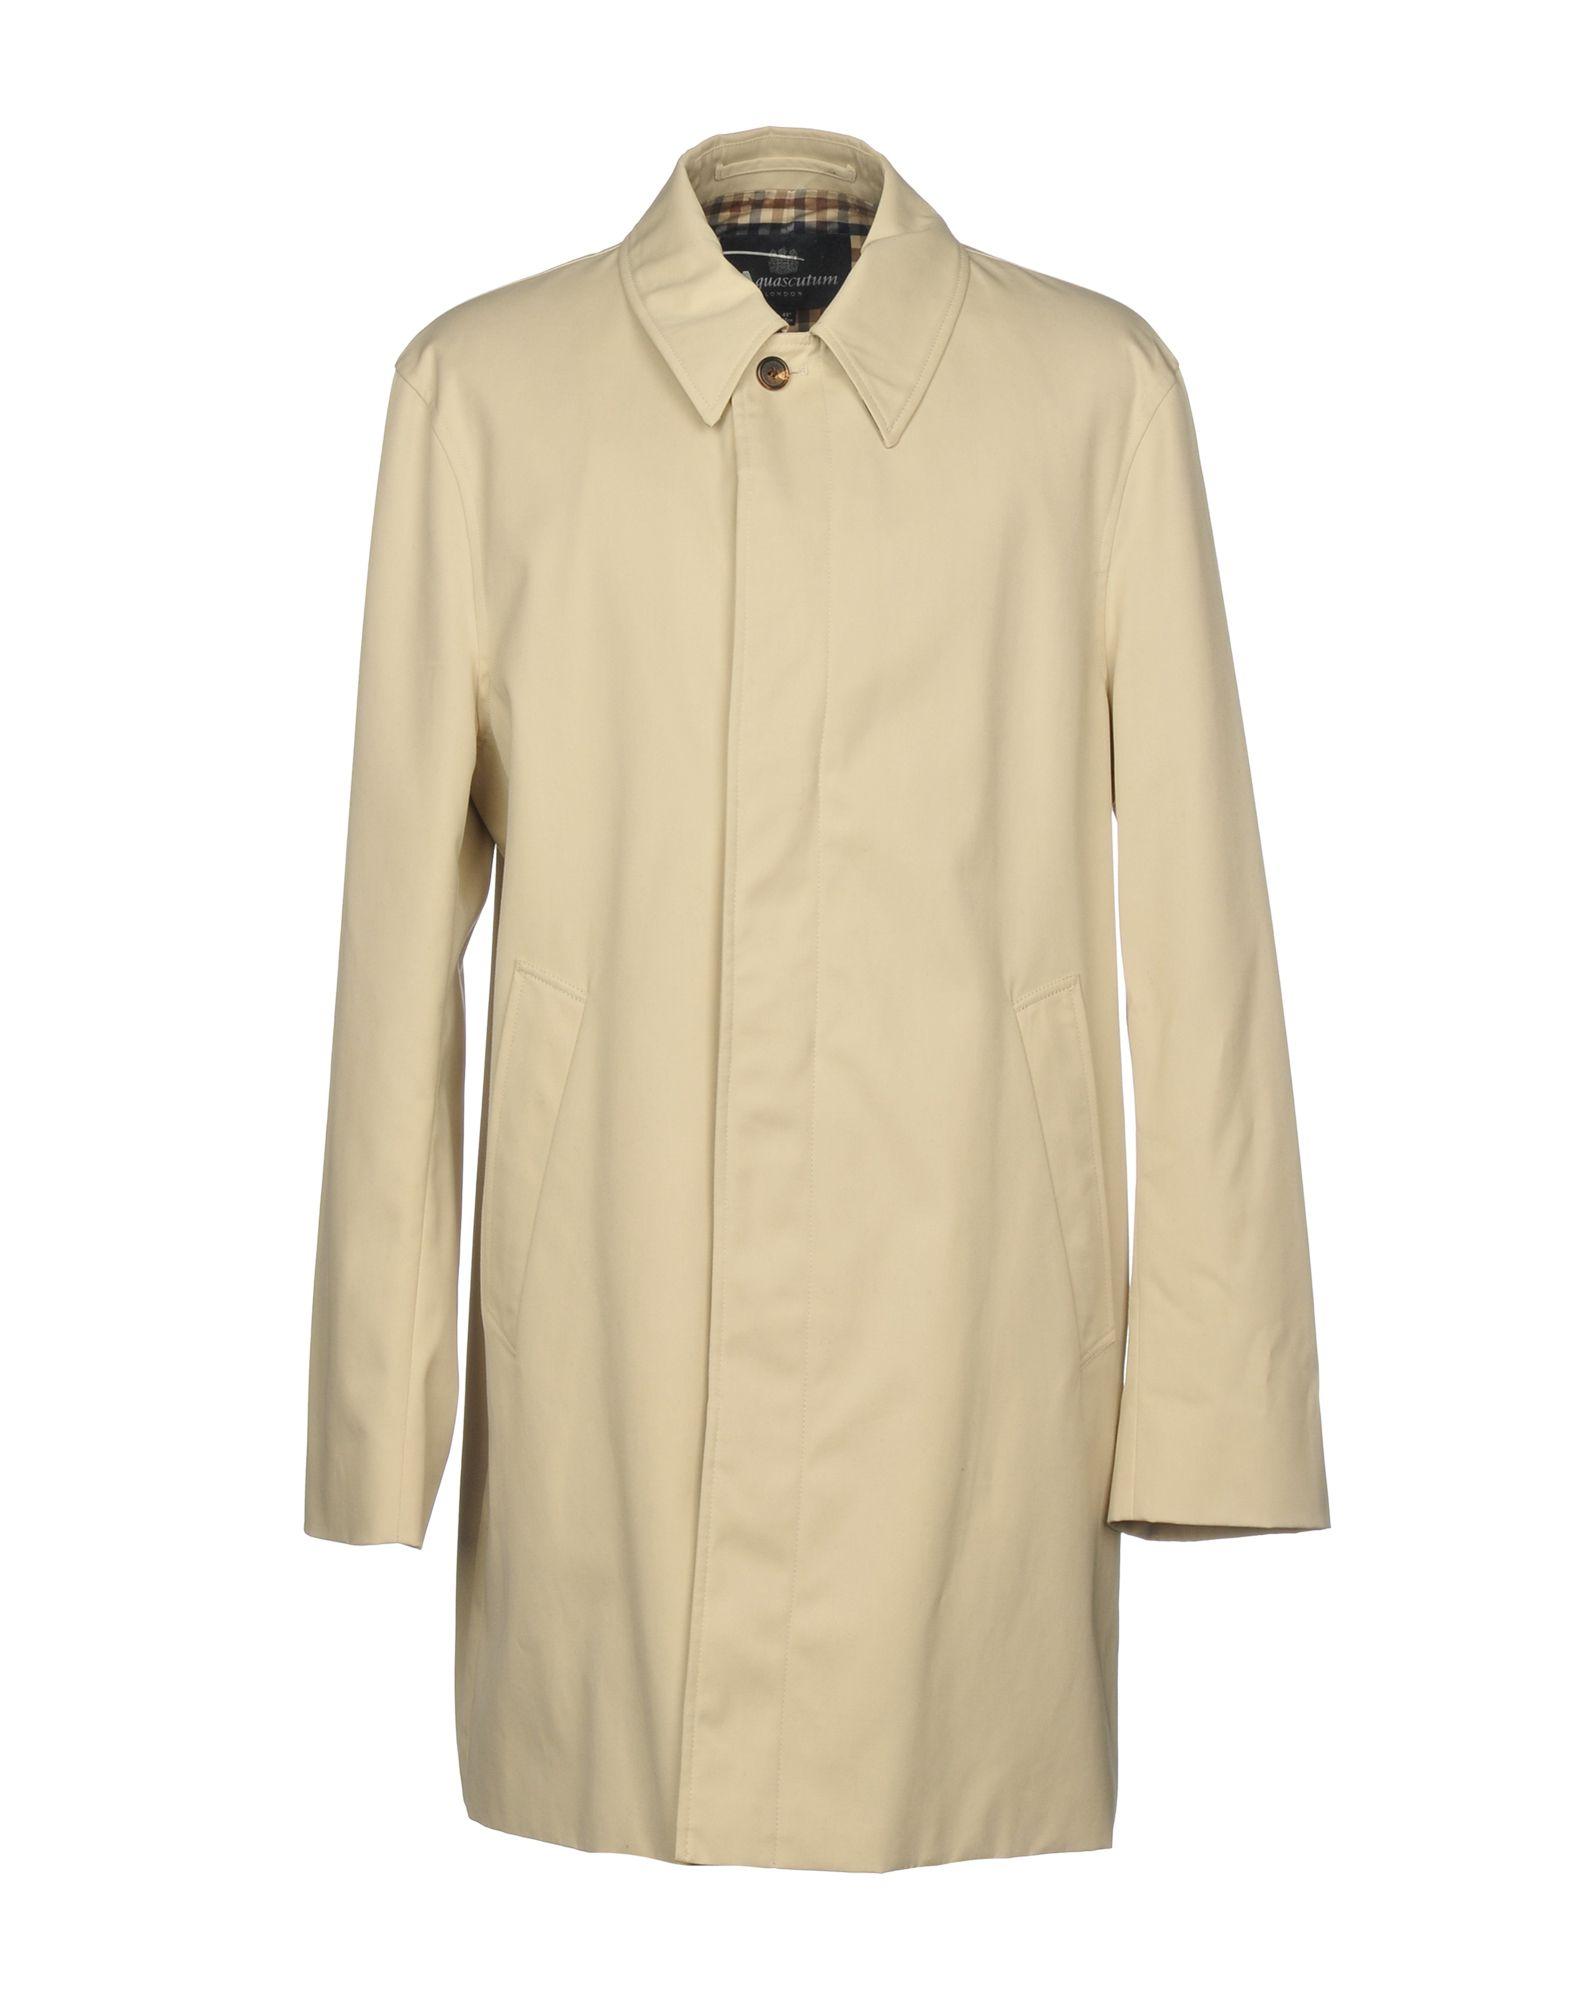 AQUASCUTUM Full-Length Jacket in Ivory